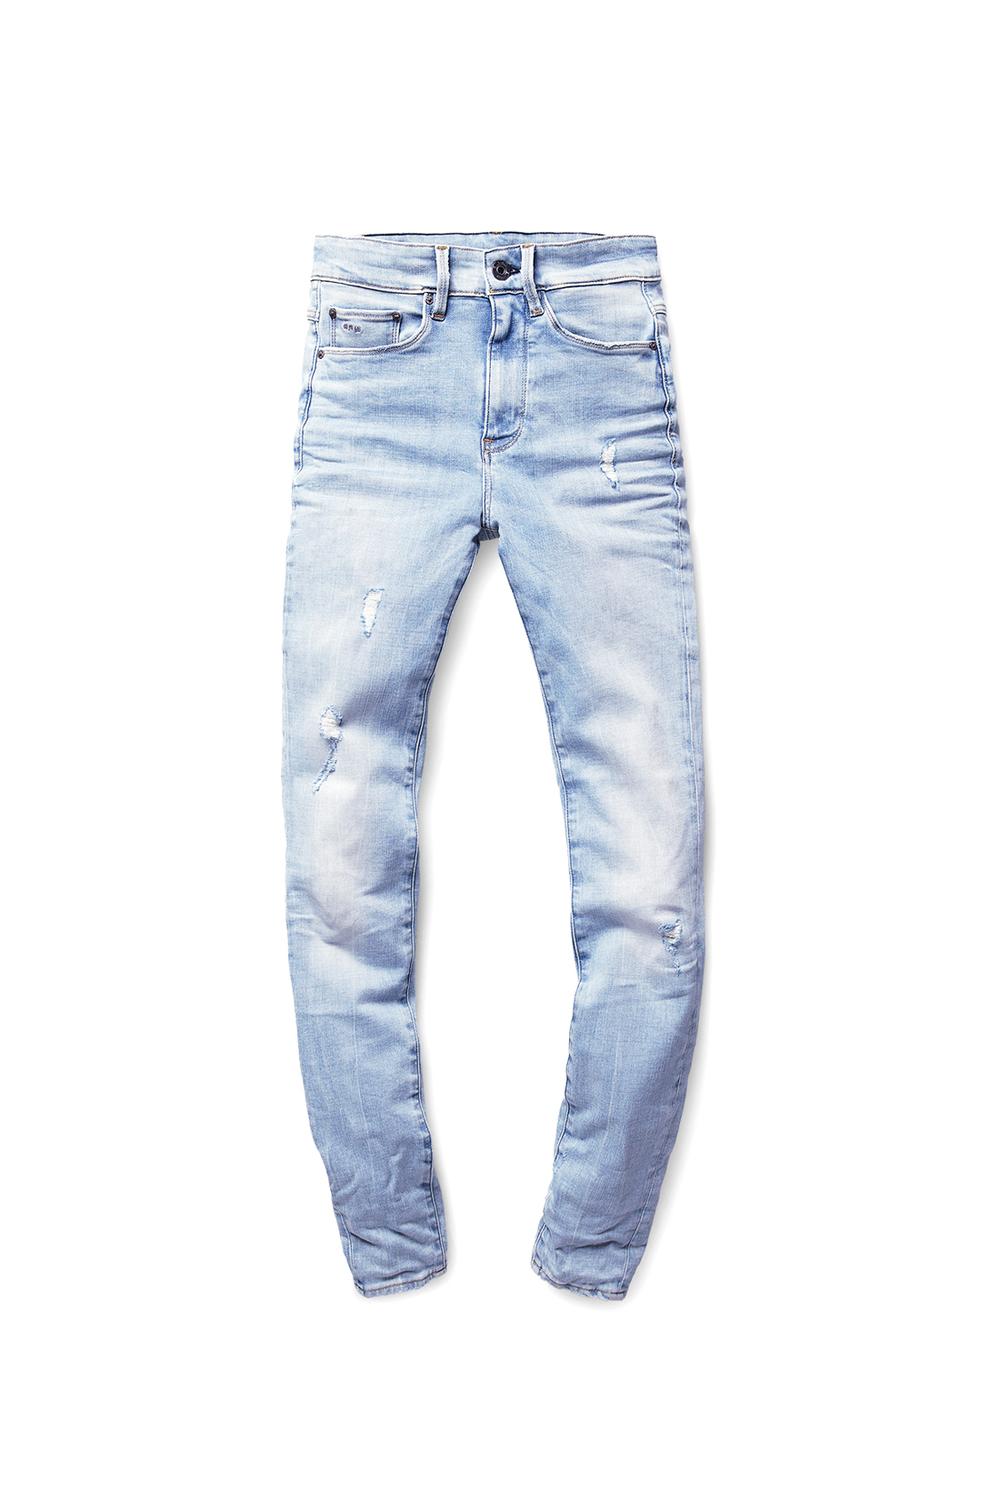 09-spring-denim-trends-high-waisted-skinnies-04.jpg